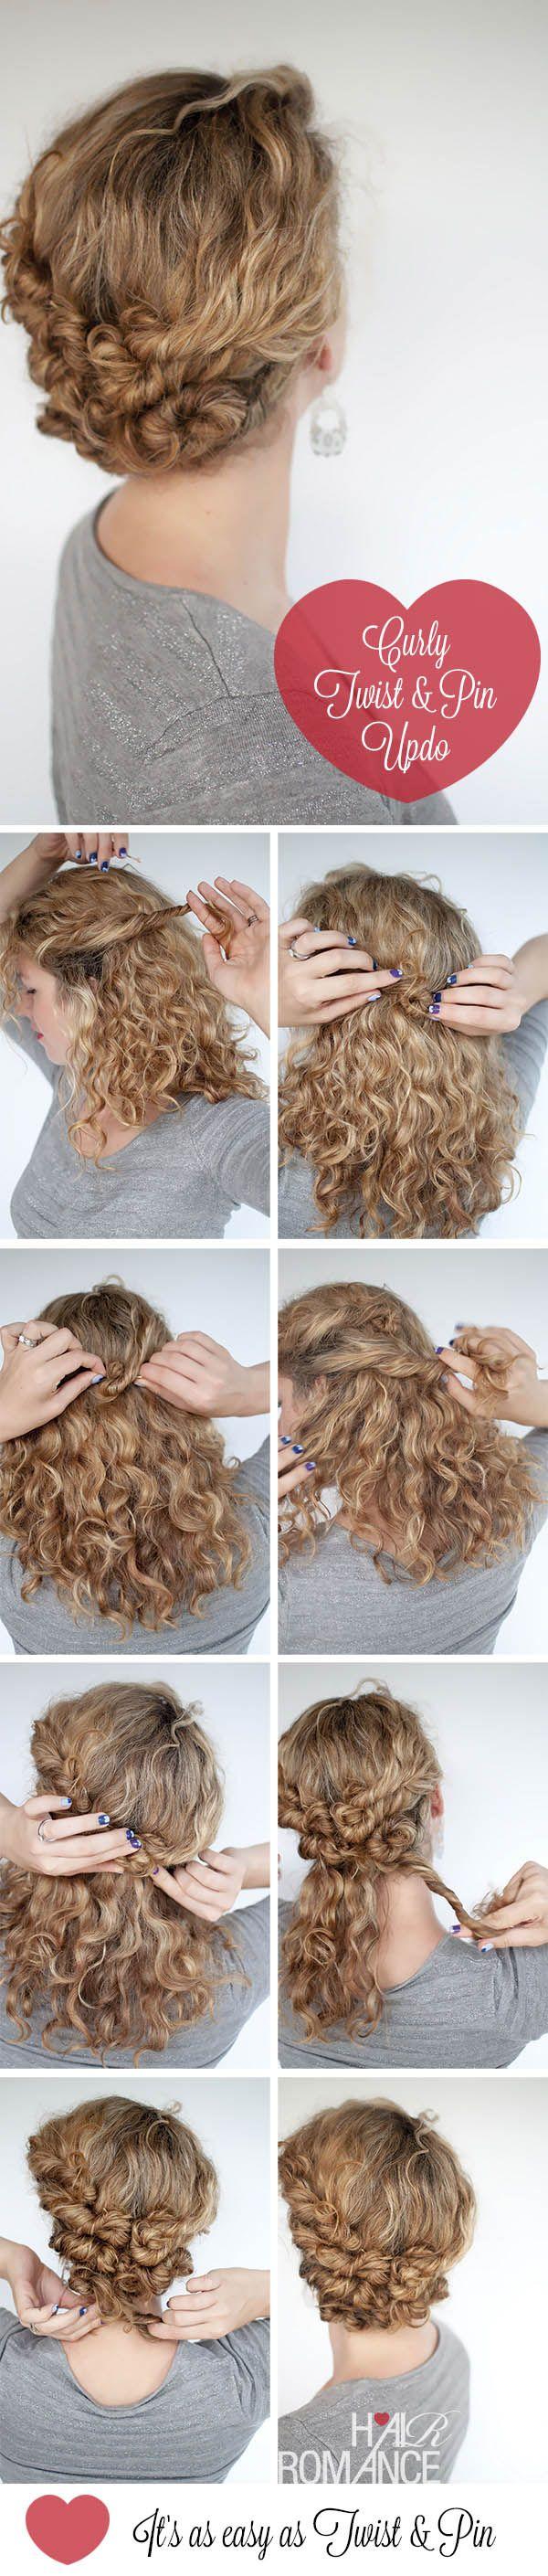 best hair u beauty that i love images on pinterest beauty tips